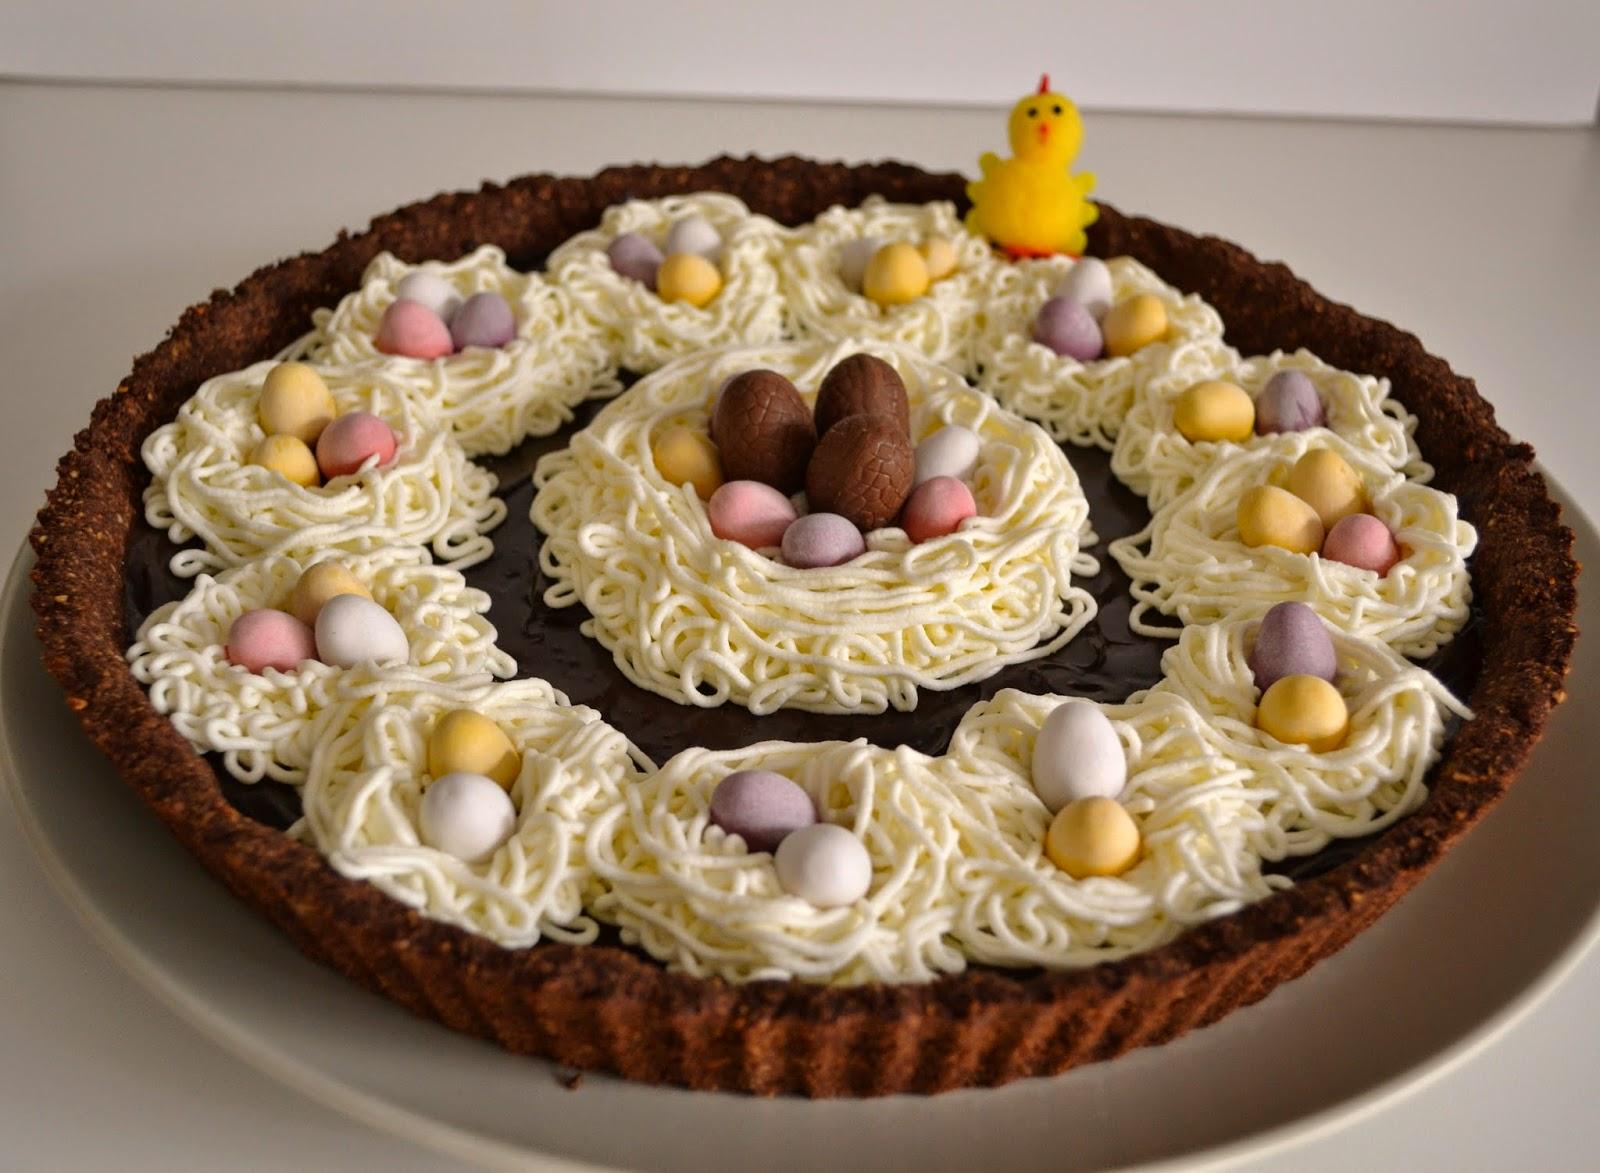 priv de dessert tarte au chocolat li geois de p ques ig bas. Black Bedroom Furniture Sets. Home Design Ideas